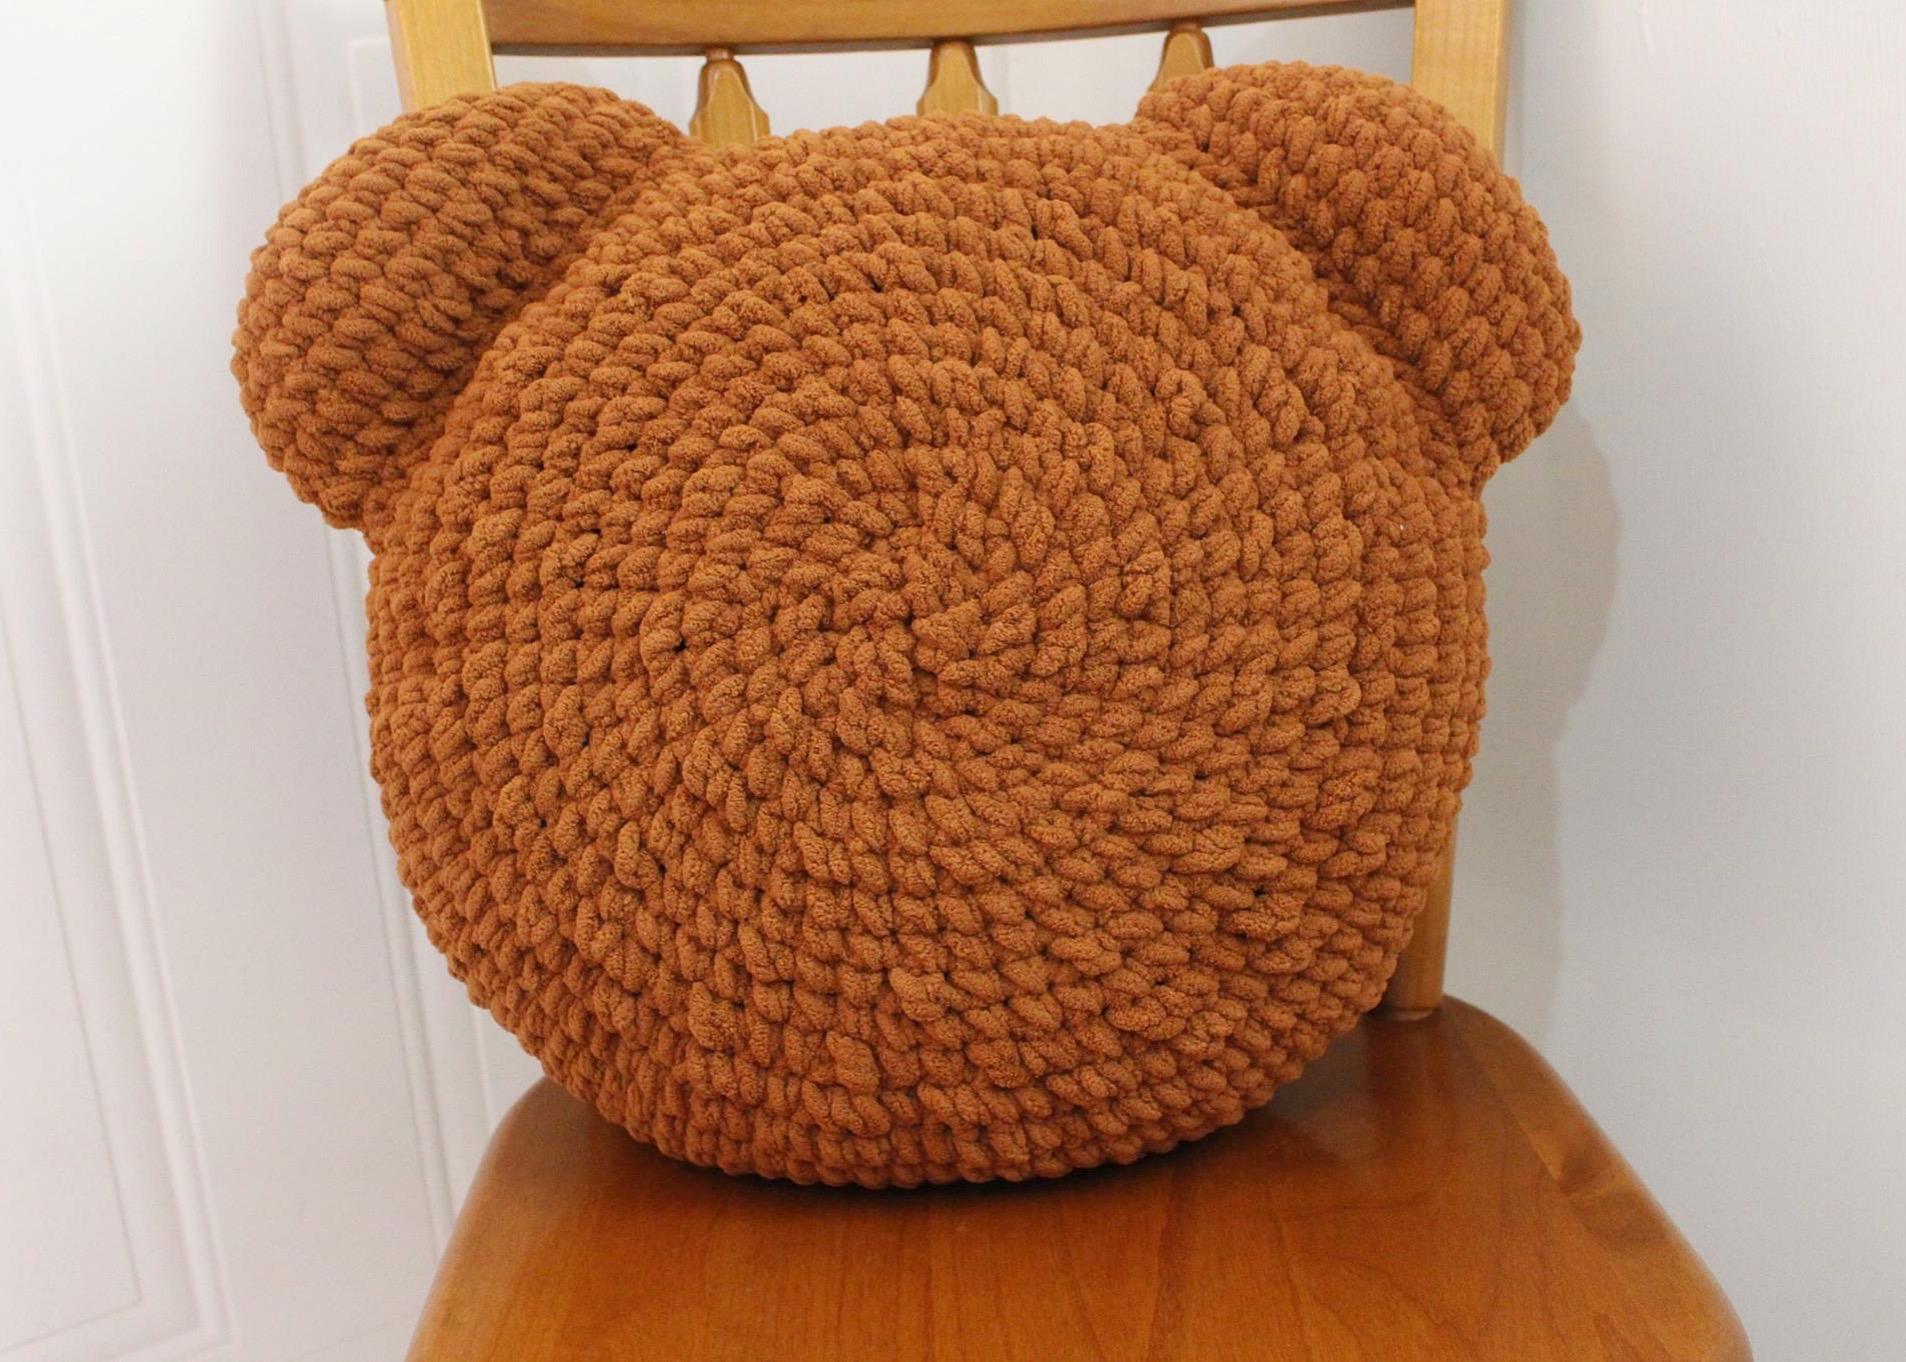 Crochet Teddy Bear Pillow (With images) | Crochet teddy bear, Crochet teddy,  Bear pillow | 1362x1906